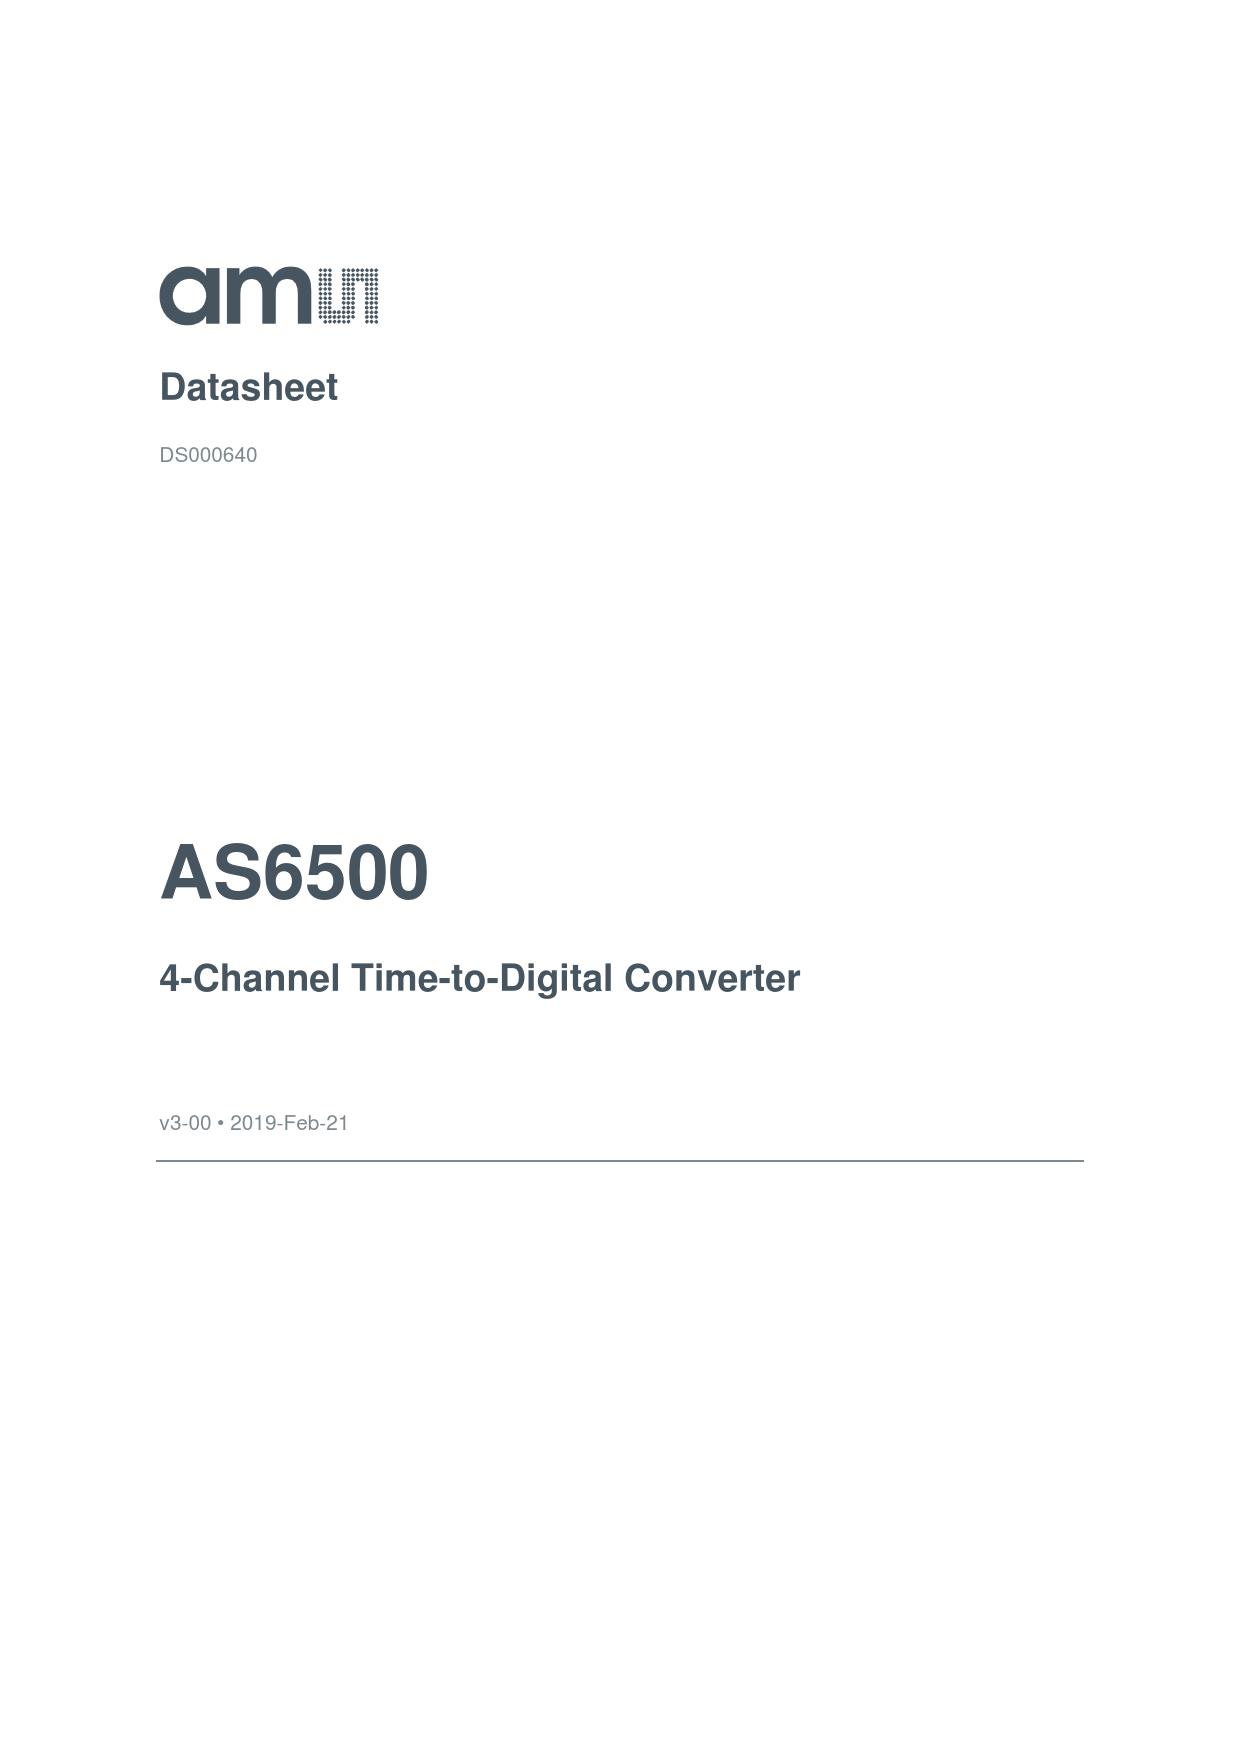 Datasheet AS6500 AustriaMicroSystems, Версия: 3-00